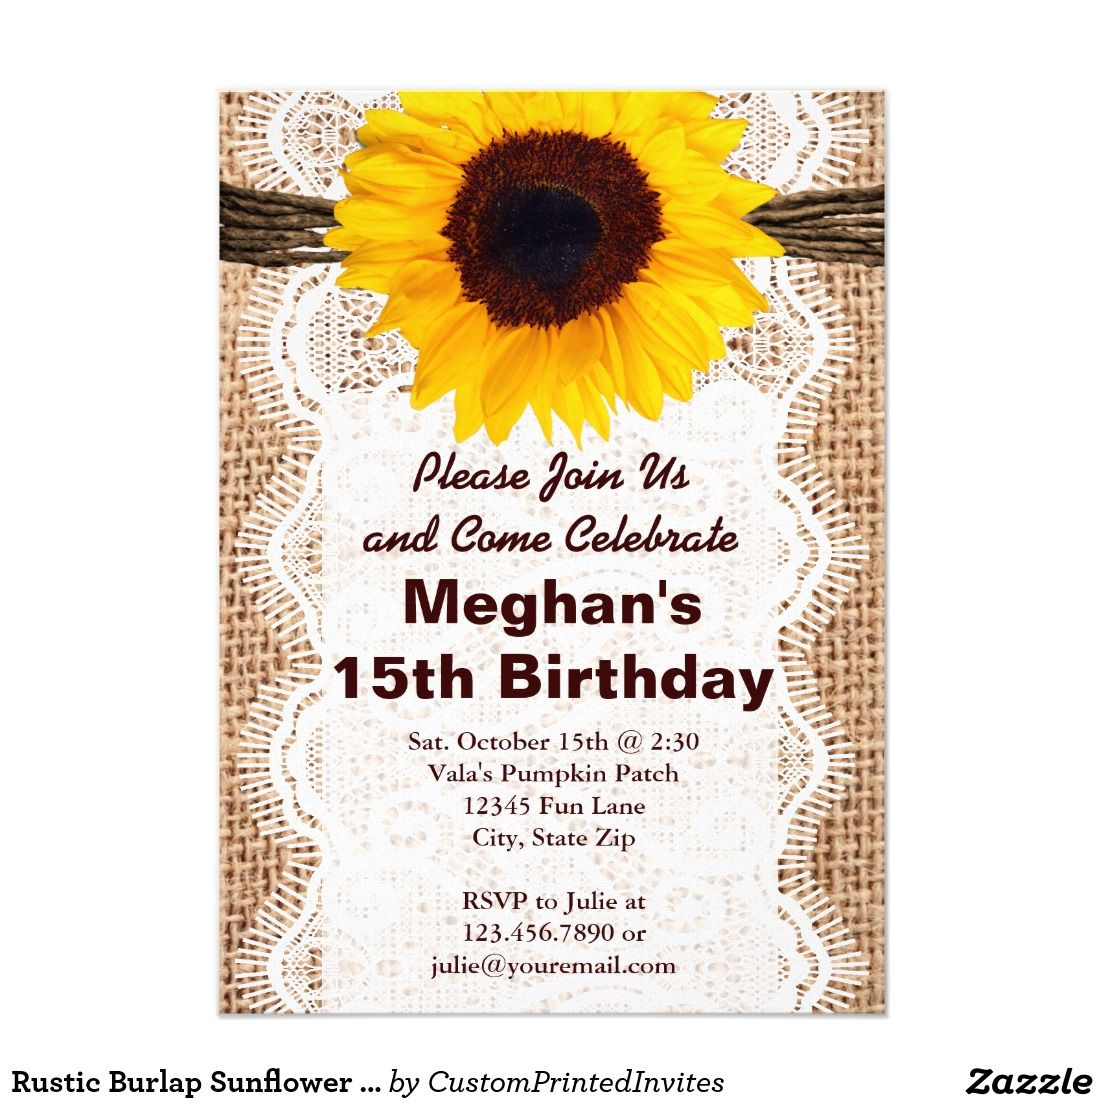 Rustic Burlap Sunflower Birthday Party Invitations | Sunflower ...